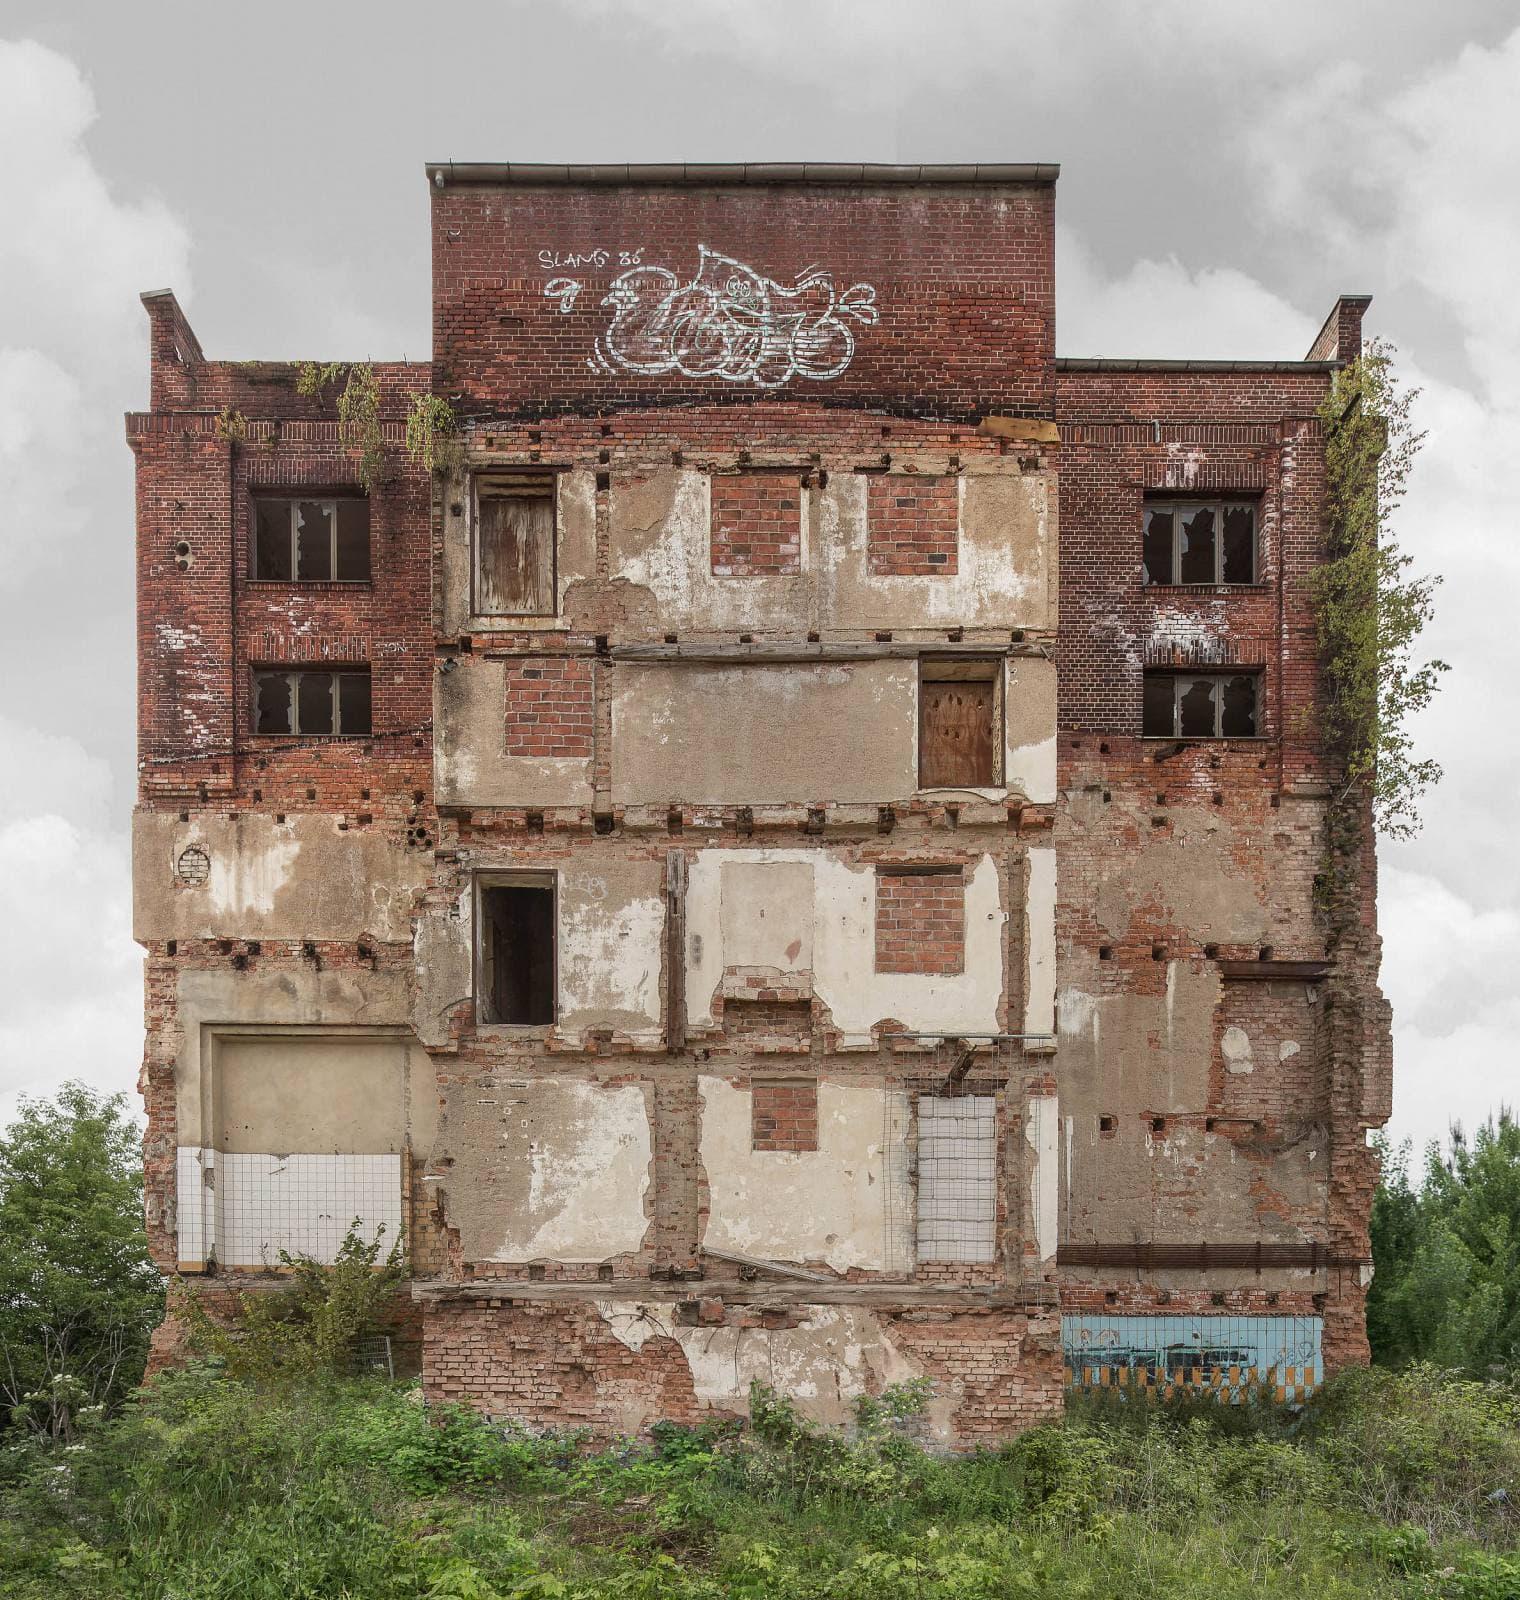 Regentaucher Architekturfotografie | Awaiting Leipzig Swiderski Ost